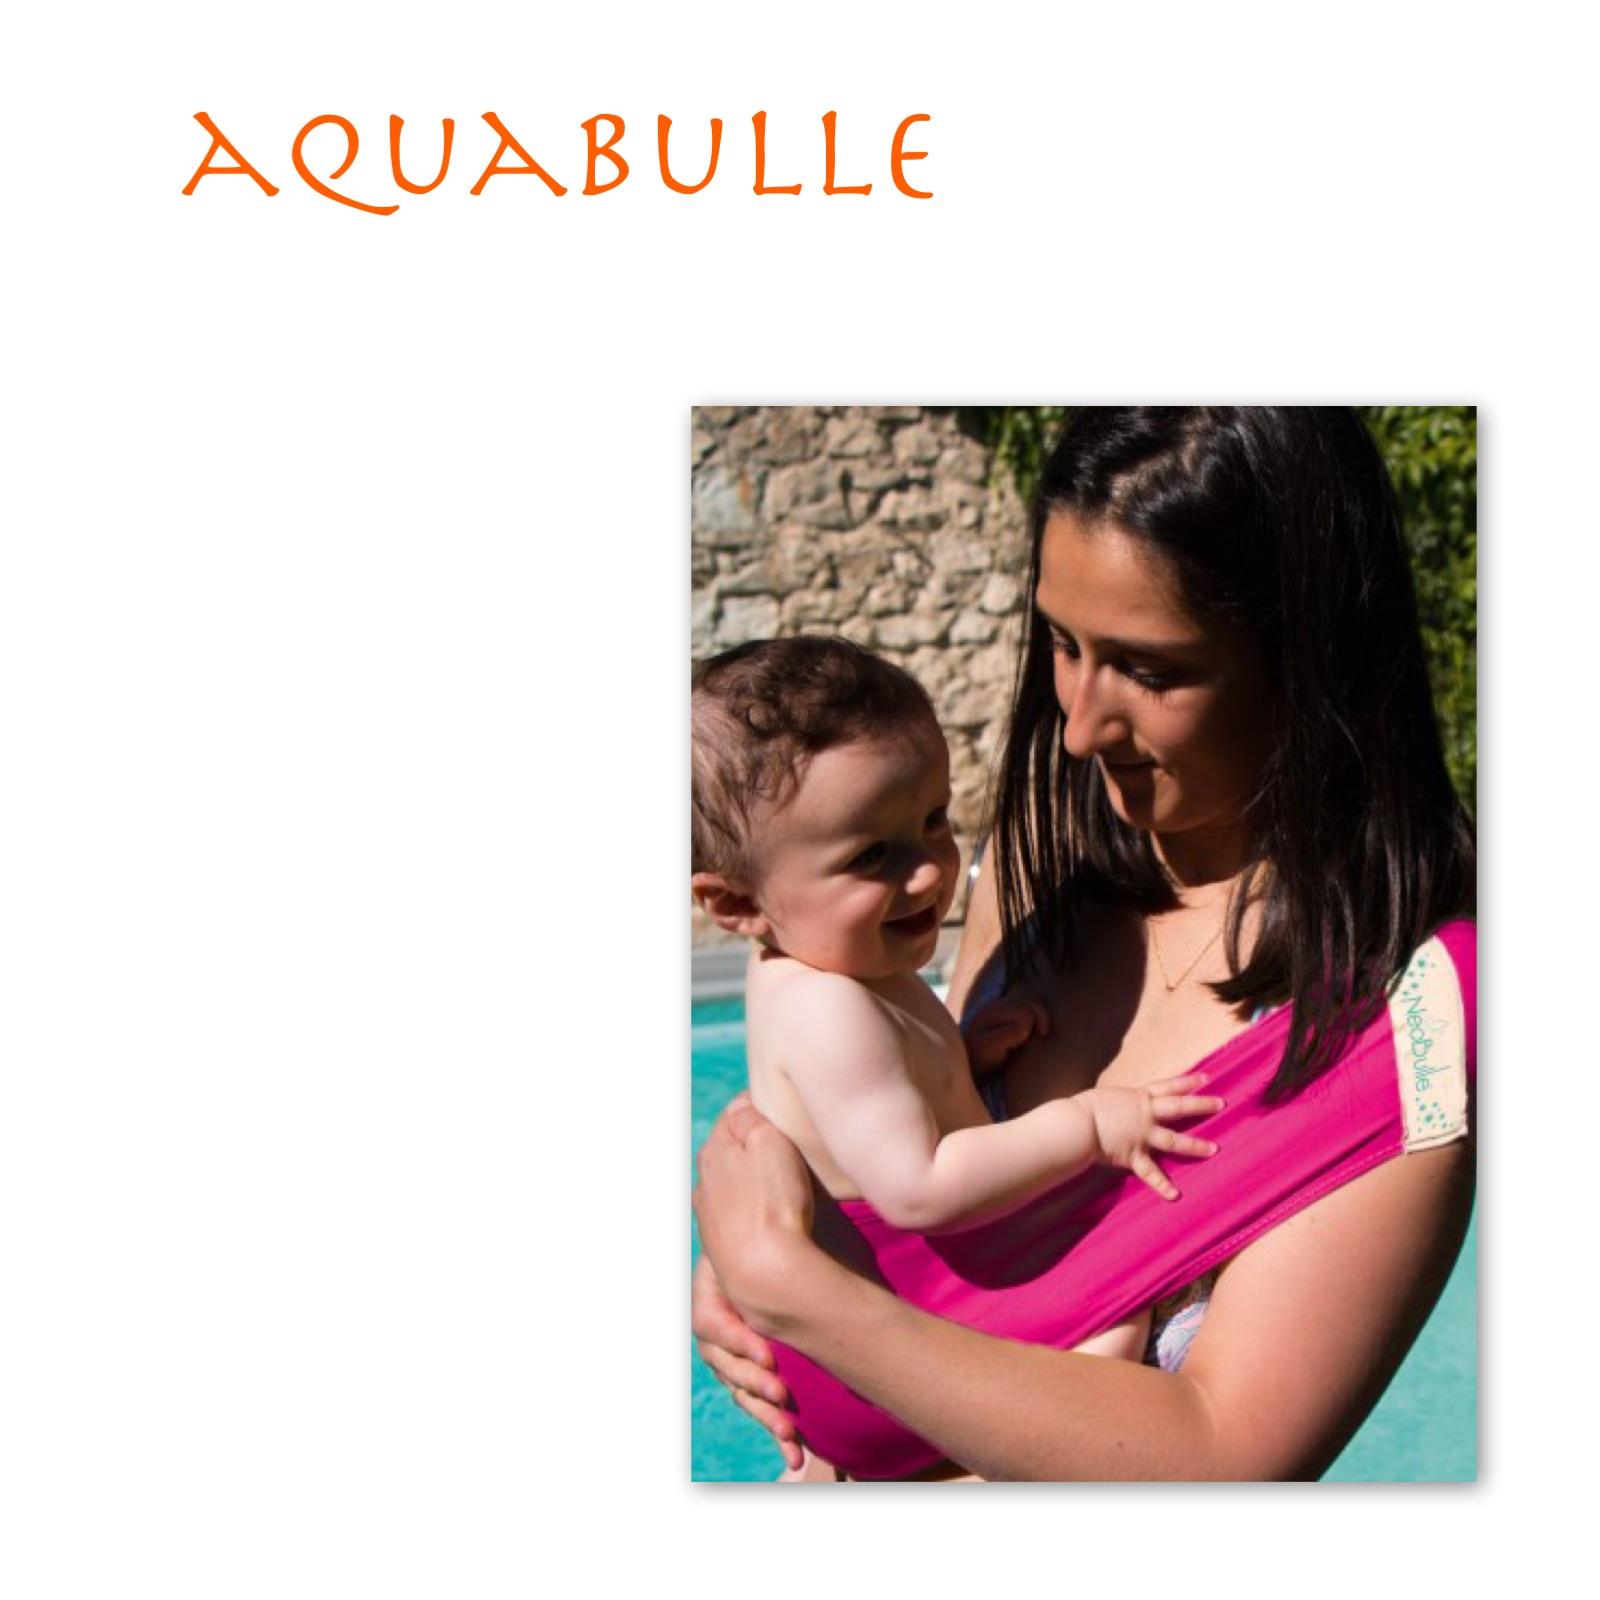 Aquabulle Néobulle